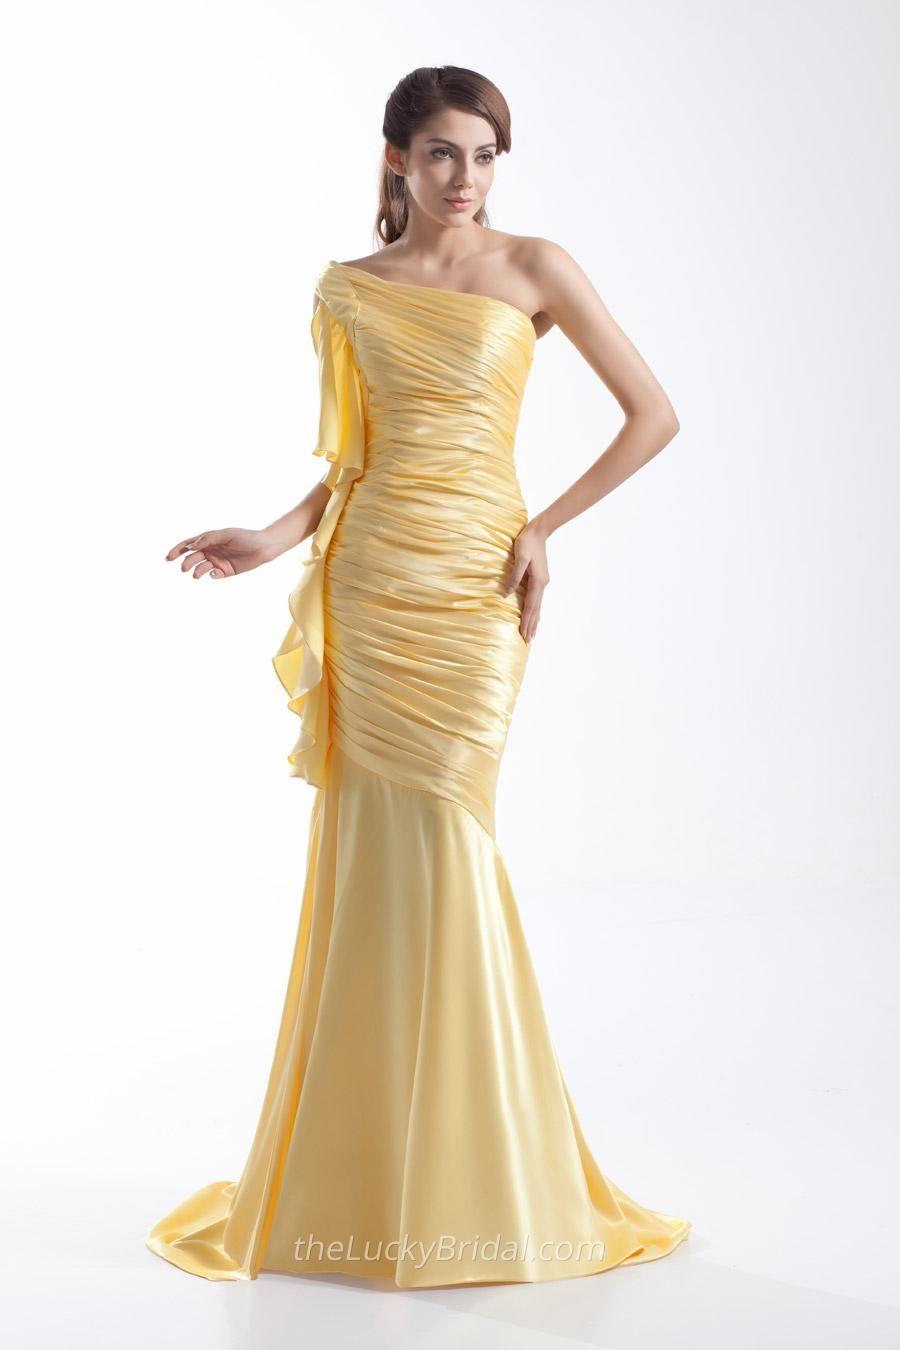 Pleated and ruffled beige oneshoulder mermaid feminine evening prom